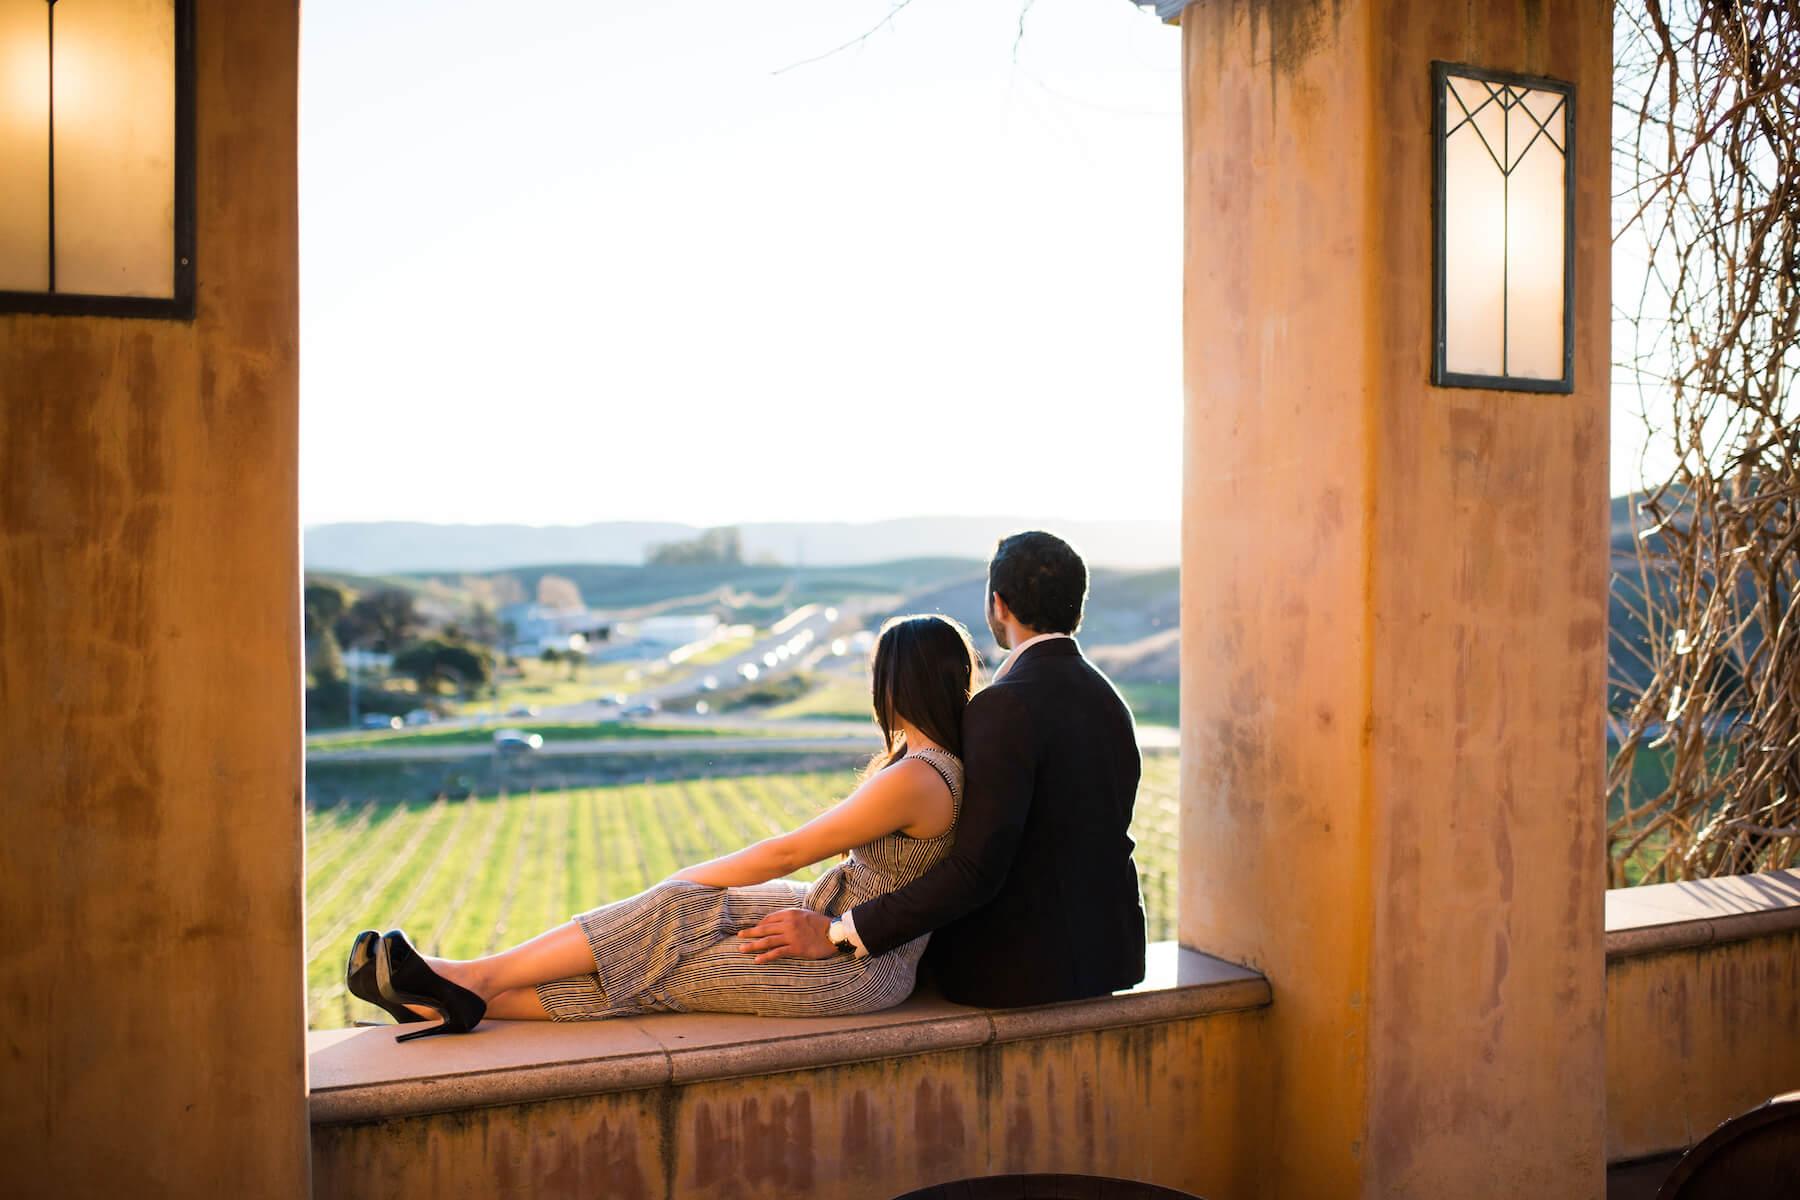 napa-sonoma-02-10-2020-couples-trip-119_original